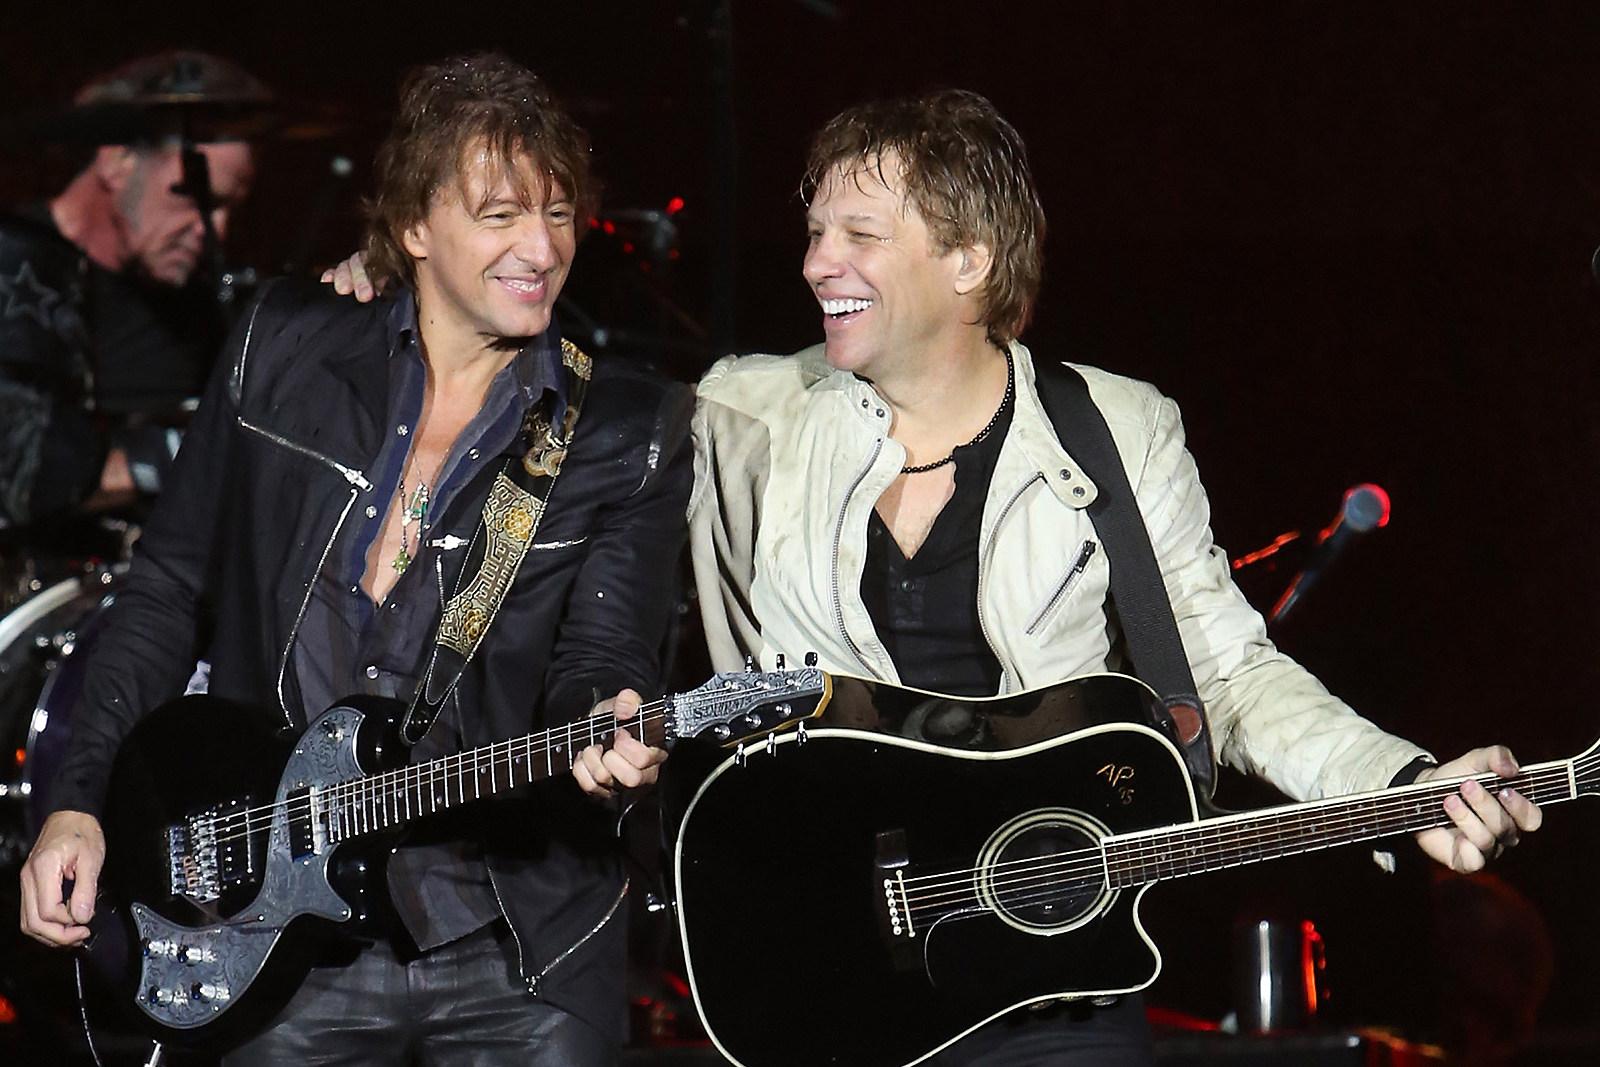 Richie Sambora Will Perform With Bon Jovi at Rock Hall Ceremony